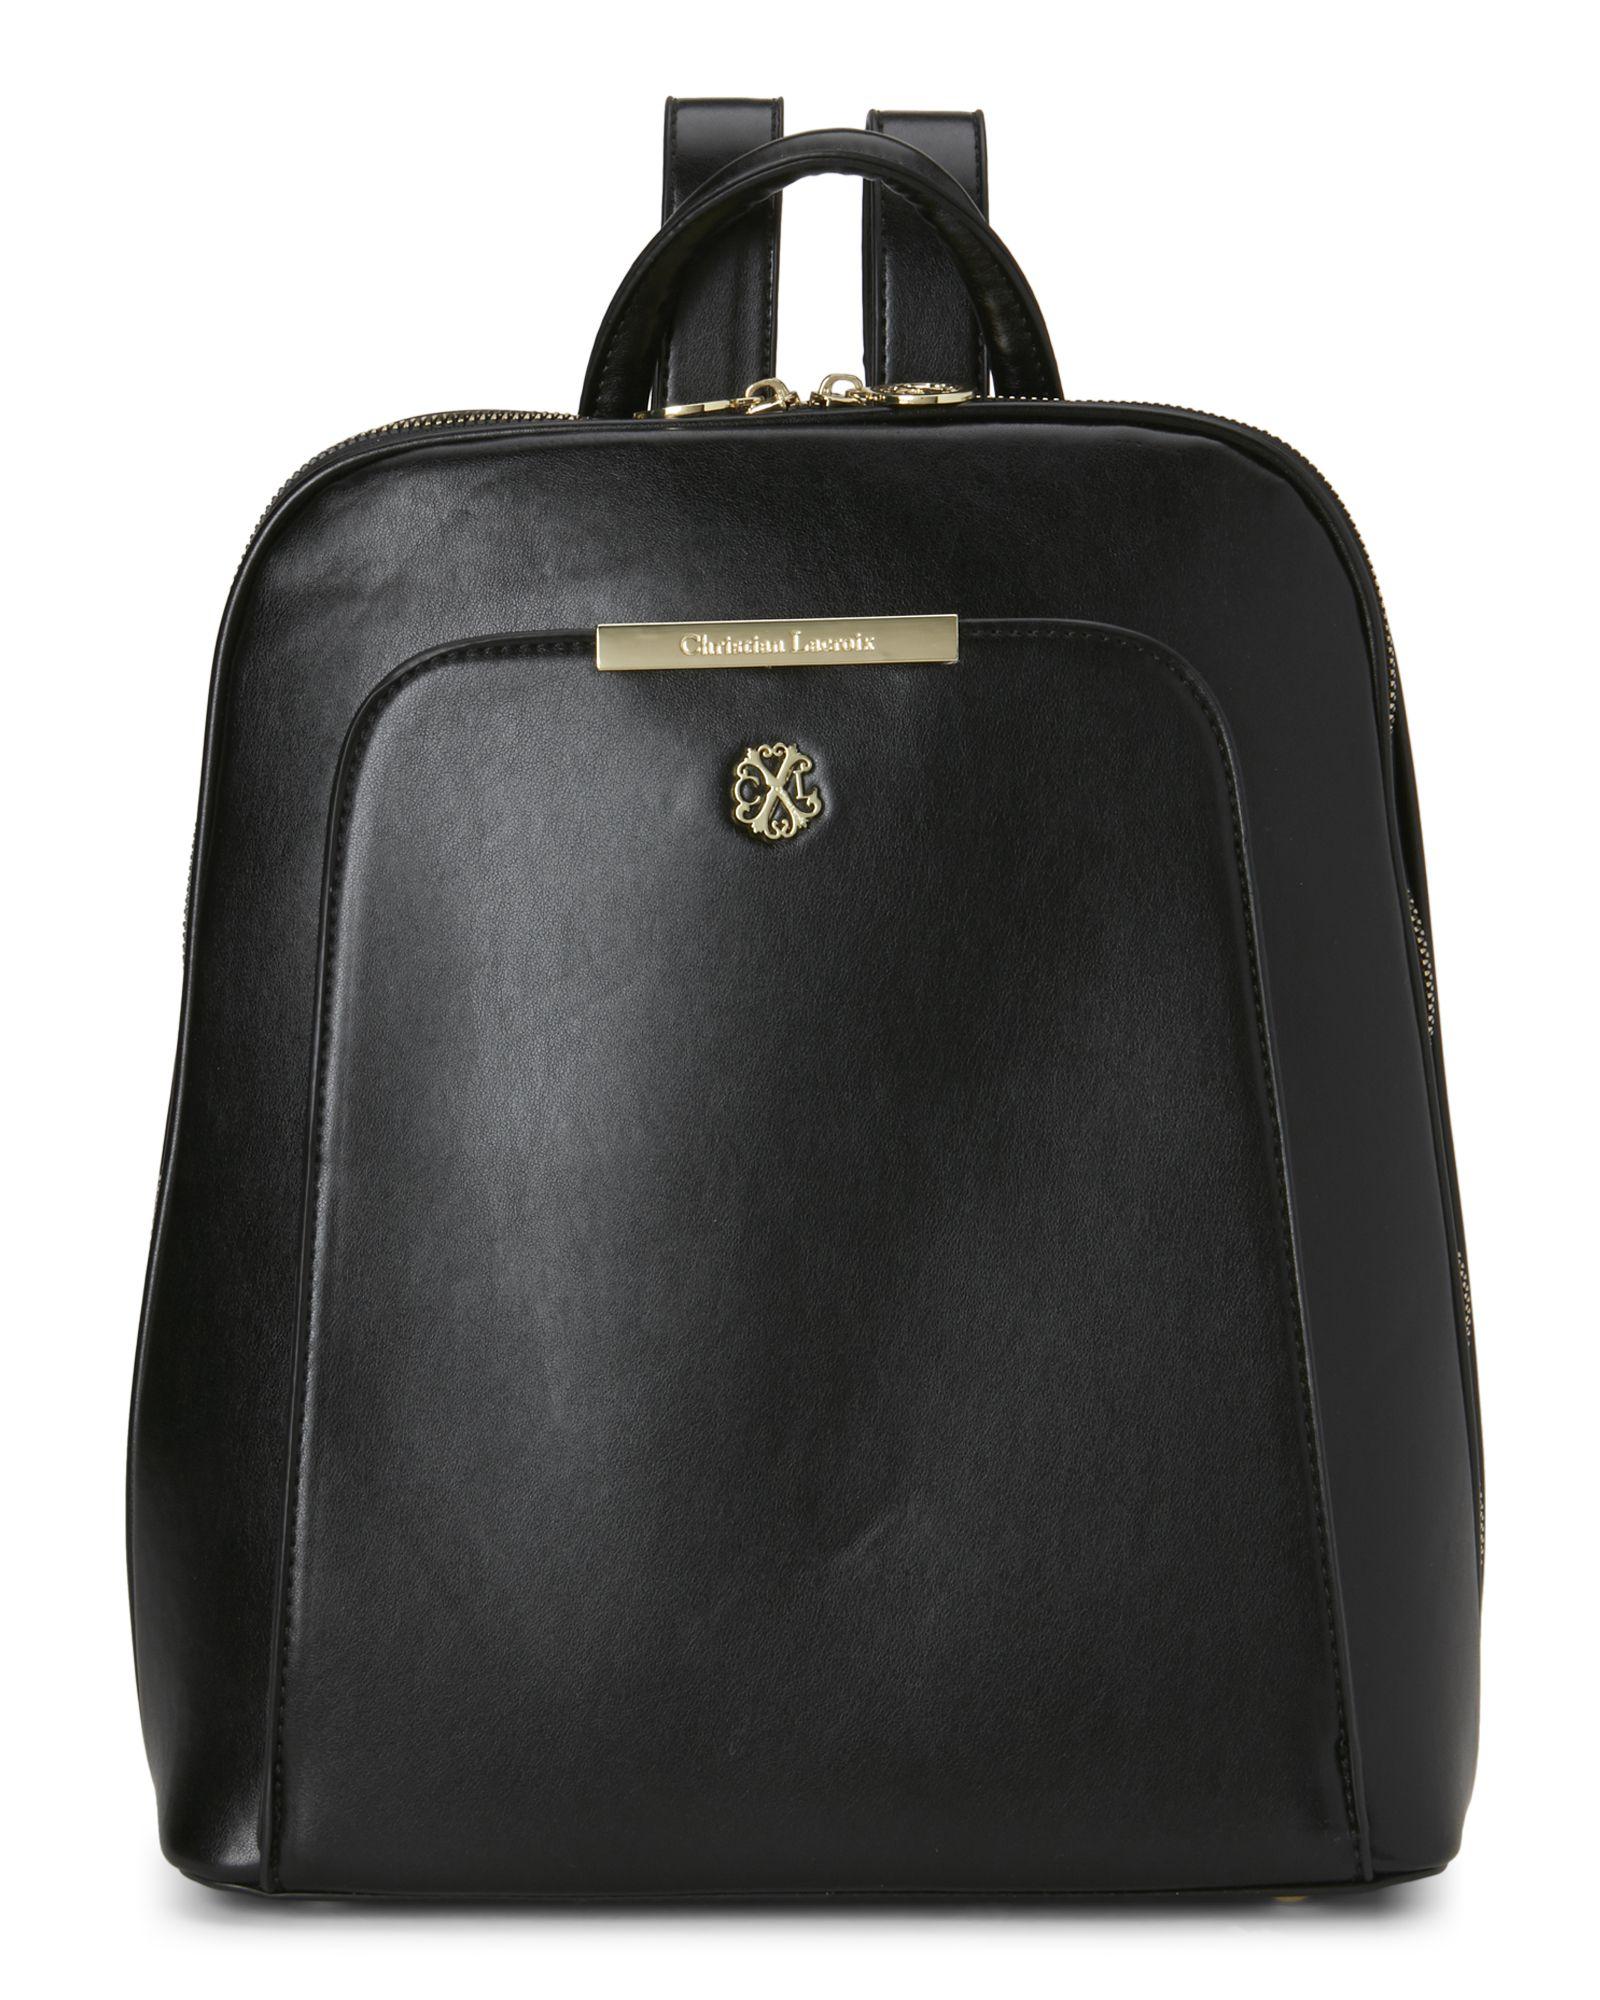 cbb0fe0fc15 Helene Backpack   *Apparel & Accessories*   Backpacks, Christian ...